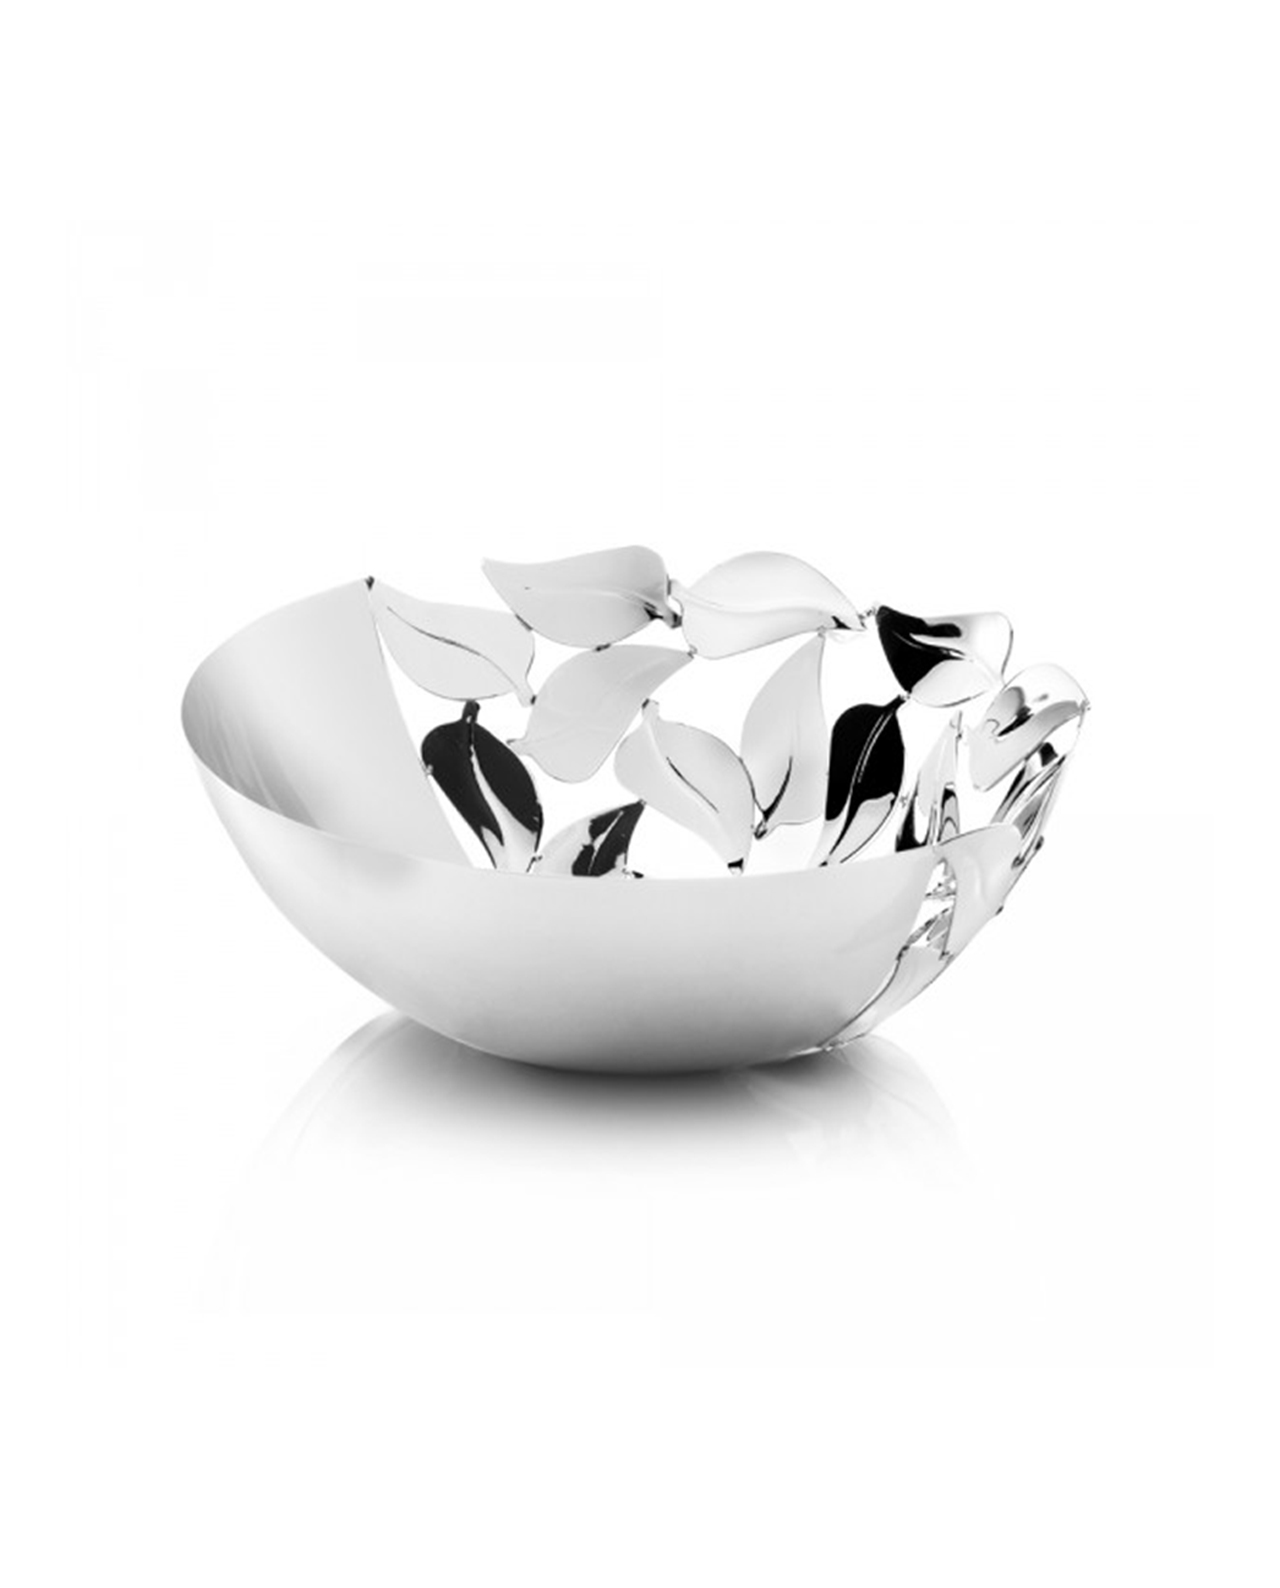 Centrotavola ottaviani con foglie mobilia store home - Centrotavola argento moderno ...